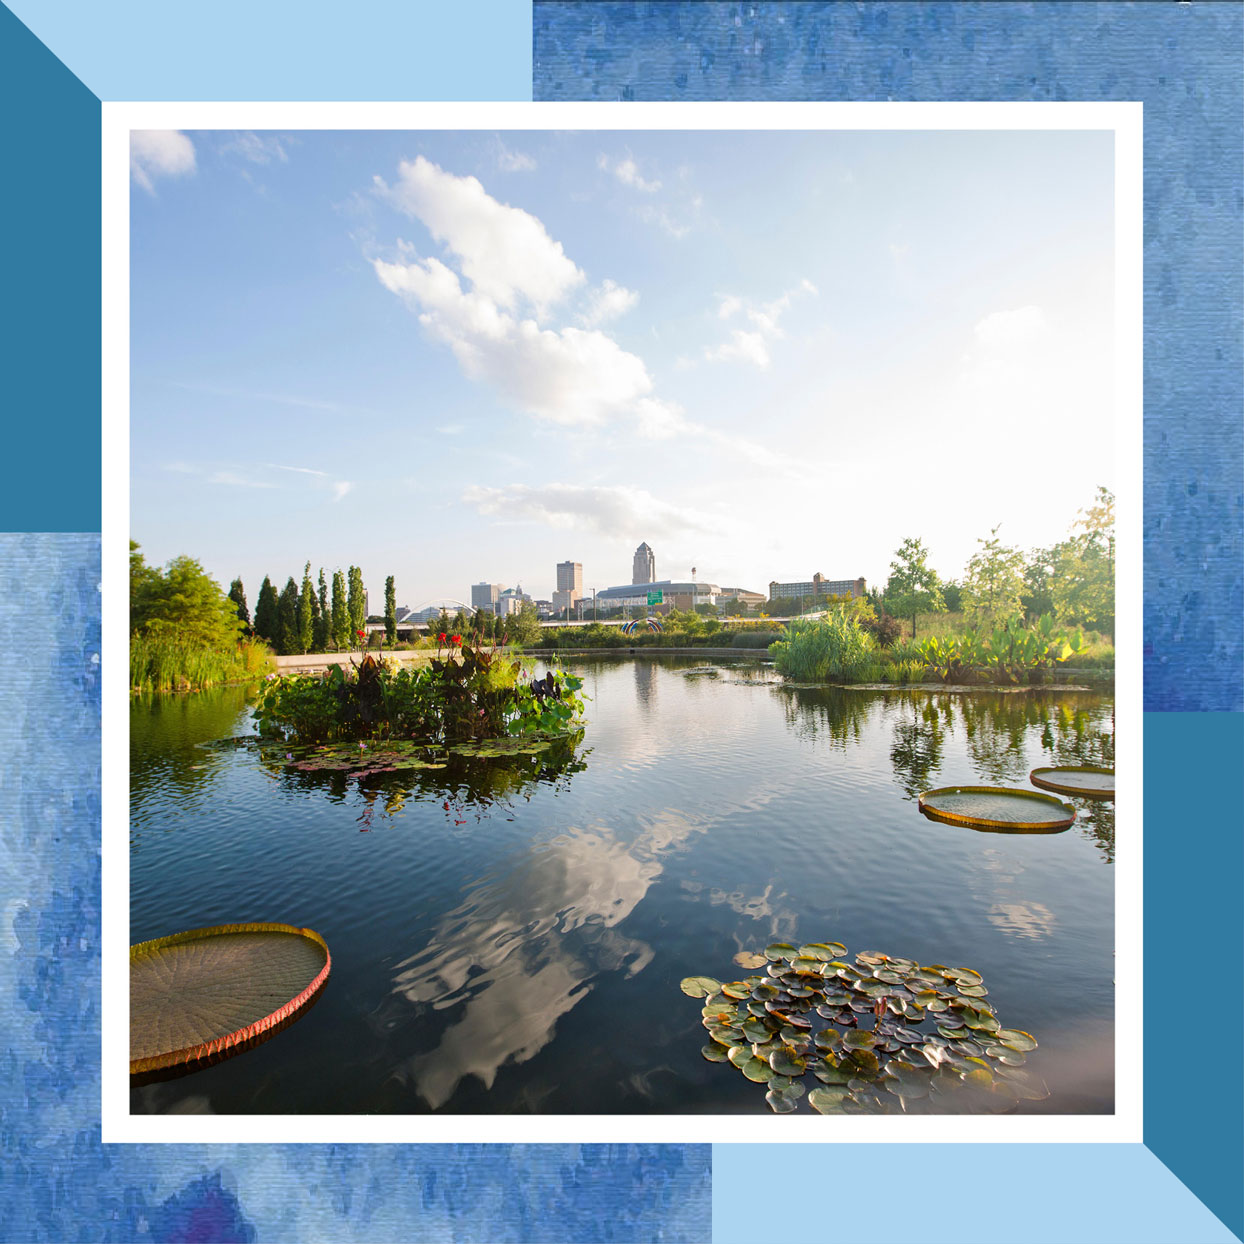 Water Garden, Greater Des Moines Botanical Garden